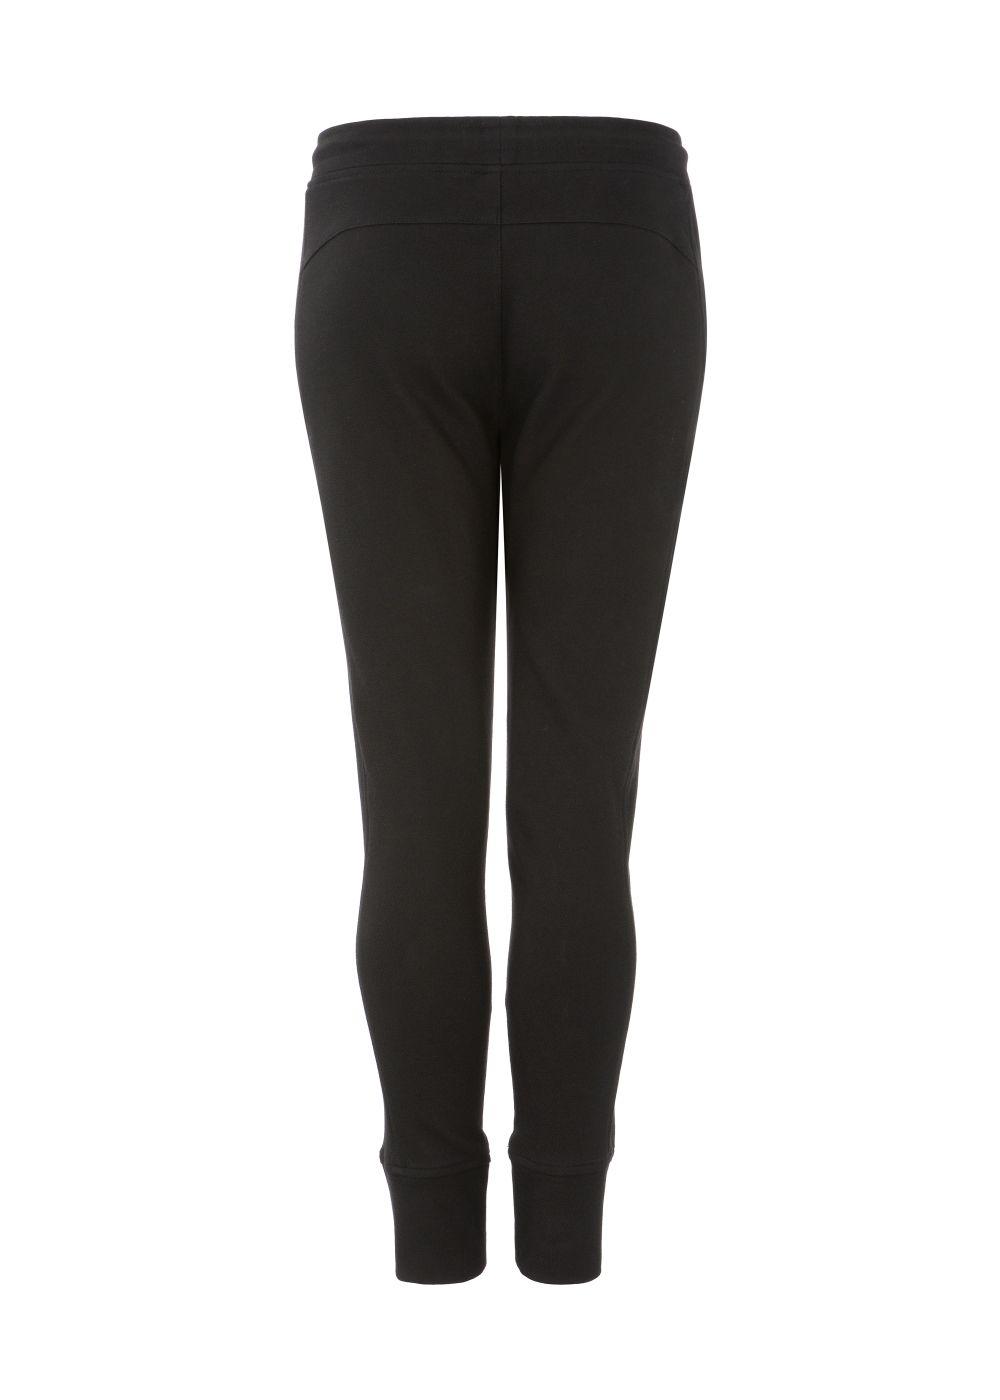 Spodnie damskie SPODT-0043-99(Z21)